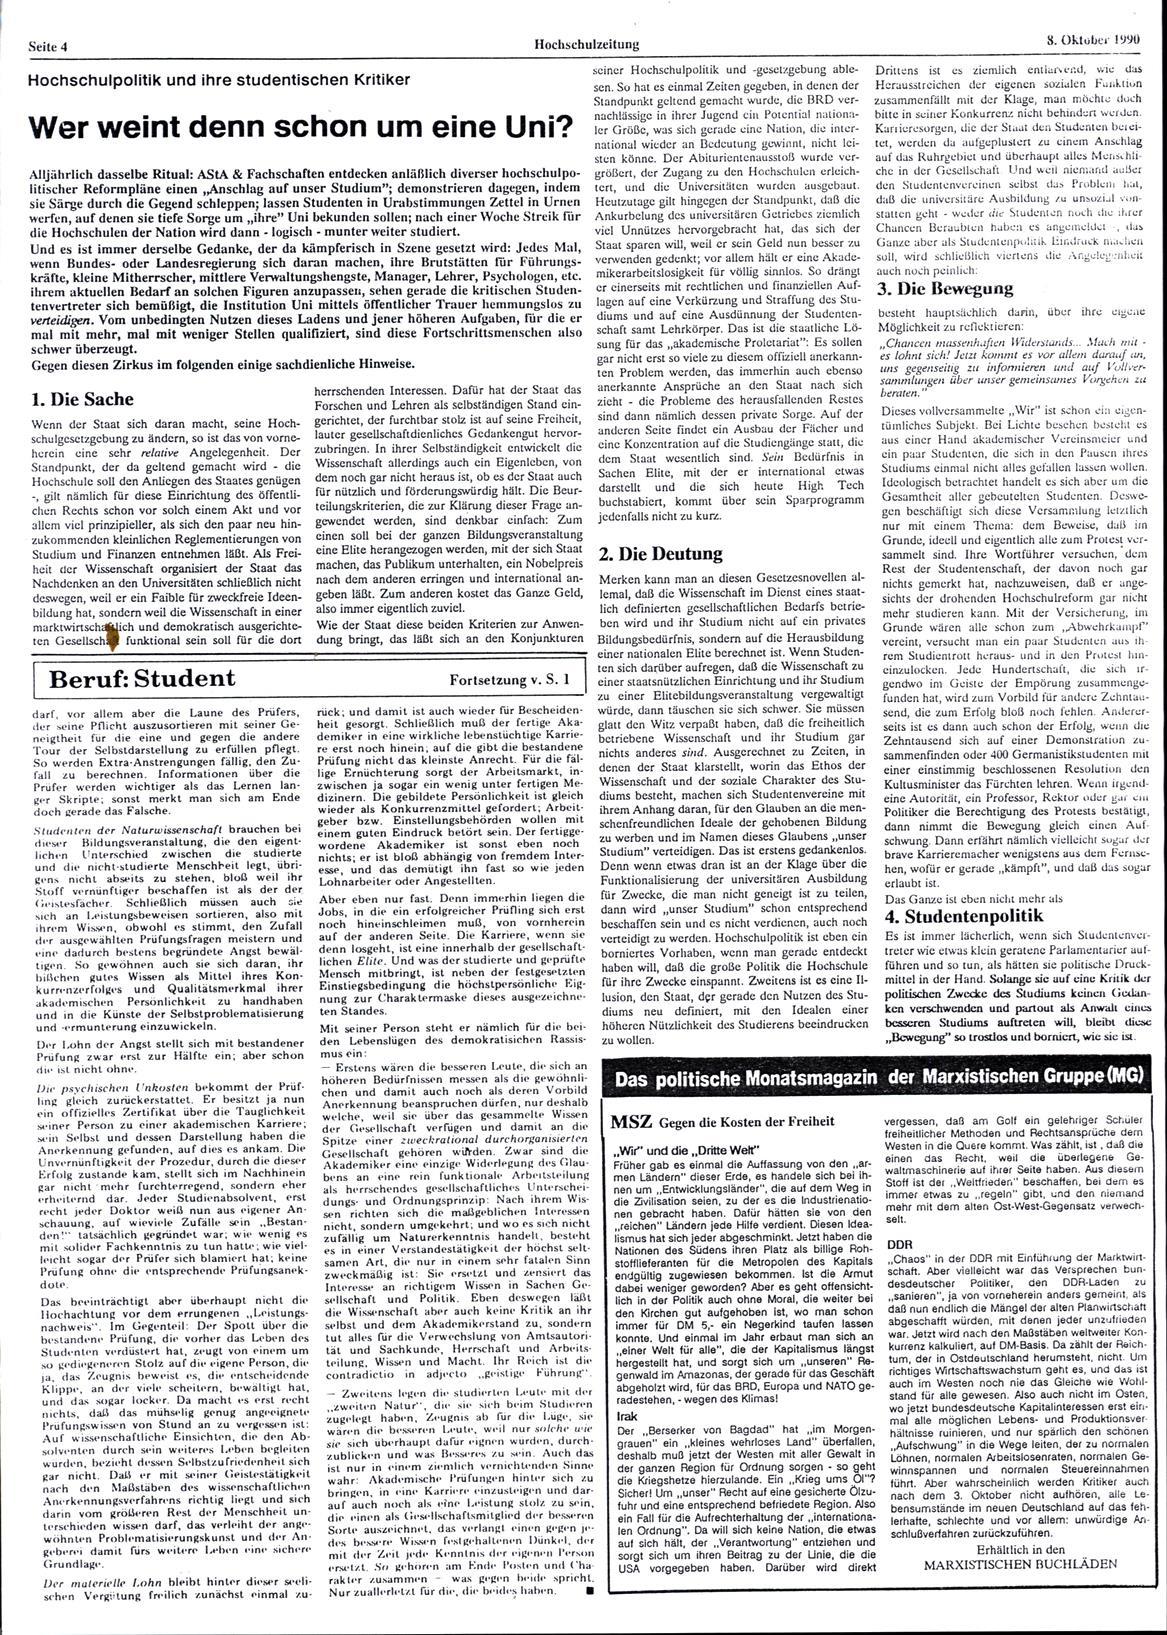 Bochum_BHZ_19901008_004